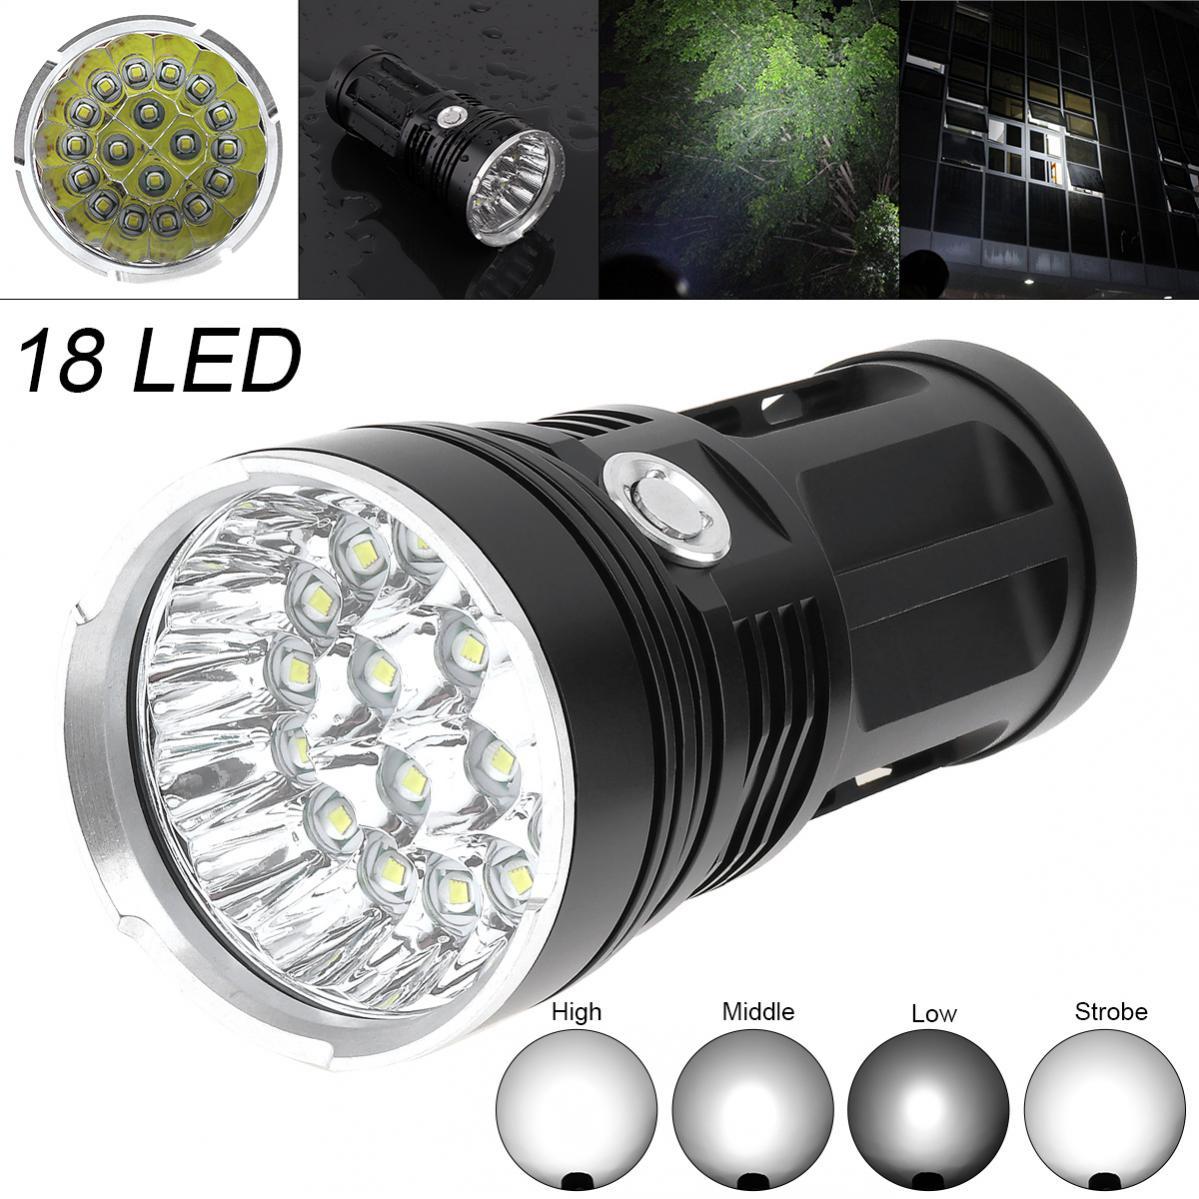 40000LM-18-x-CREE-XM-L-T6-LED-4-Modes-Flashlight-Torch-4-x-18650-Hunting-Lamp